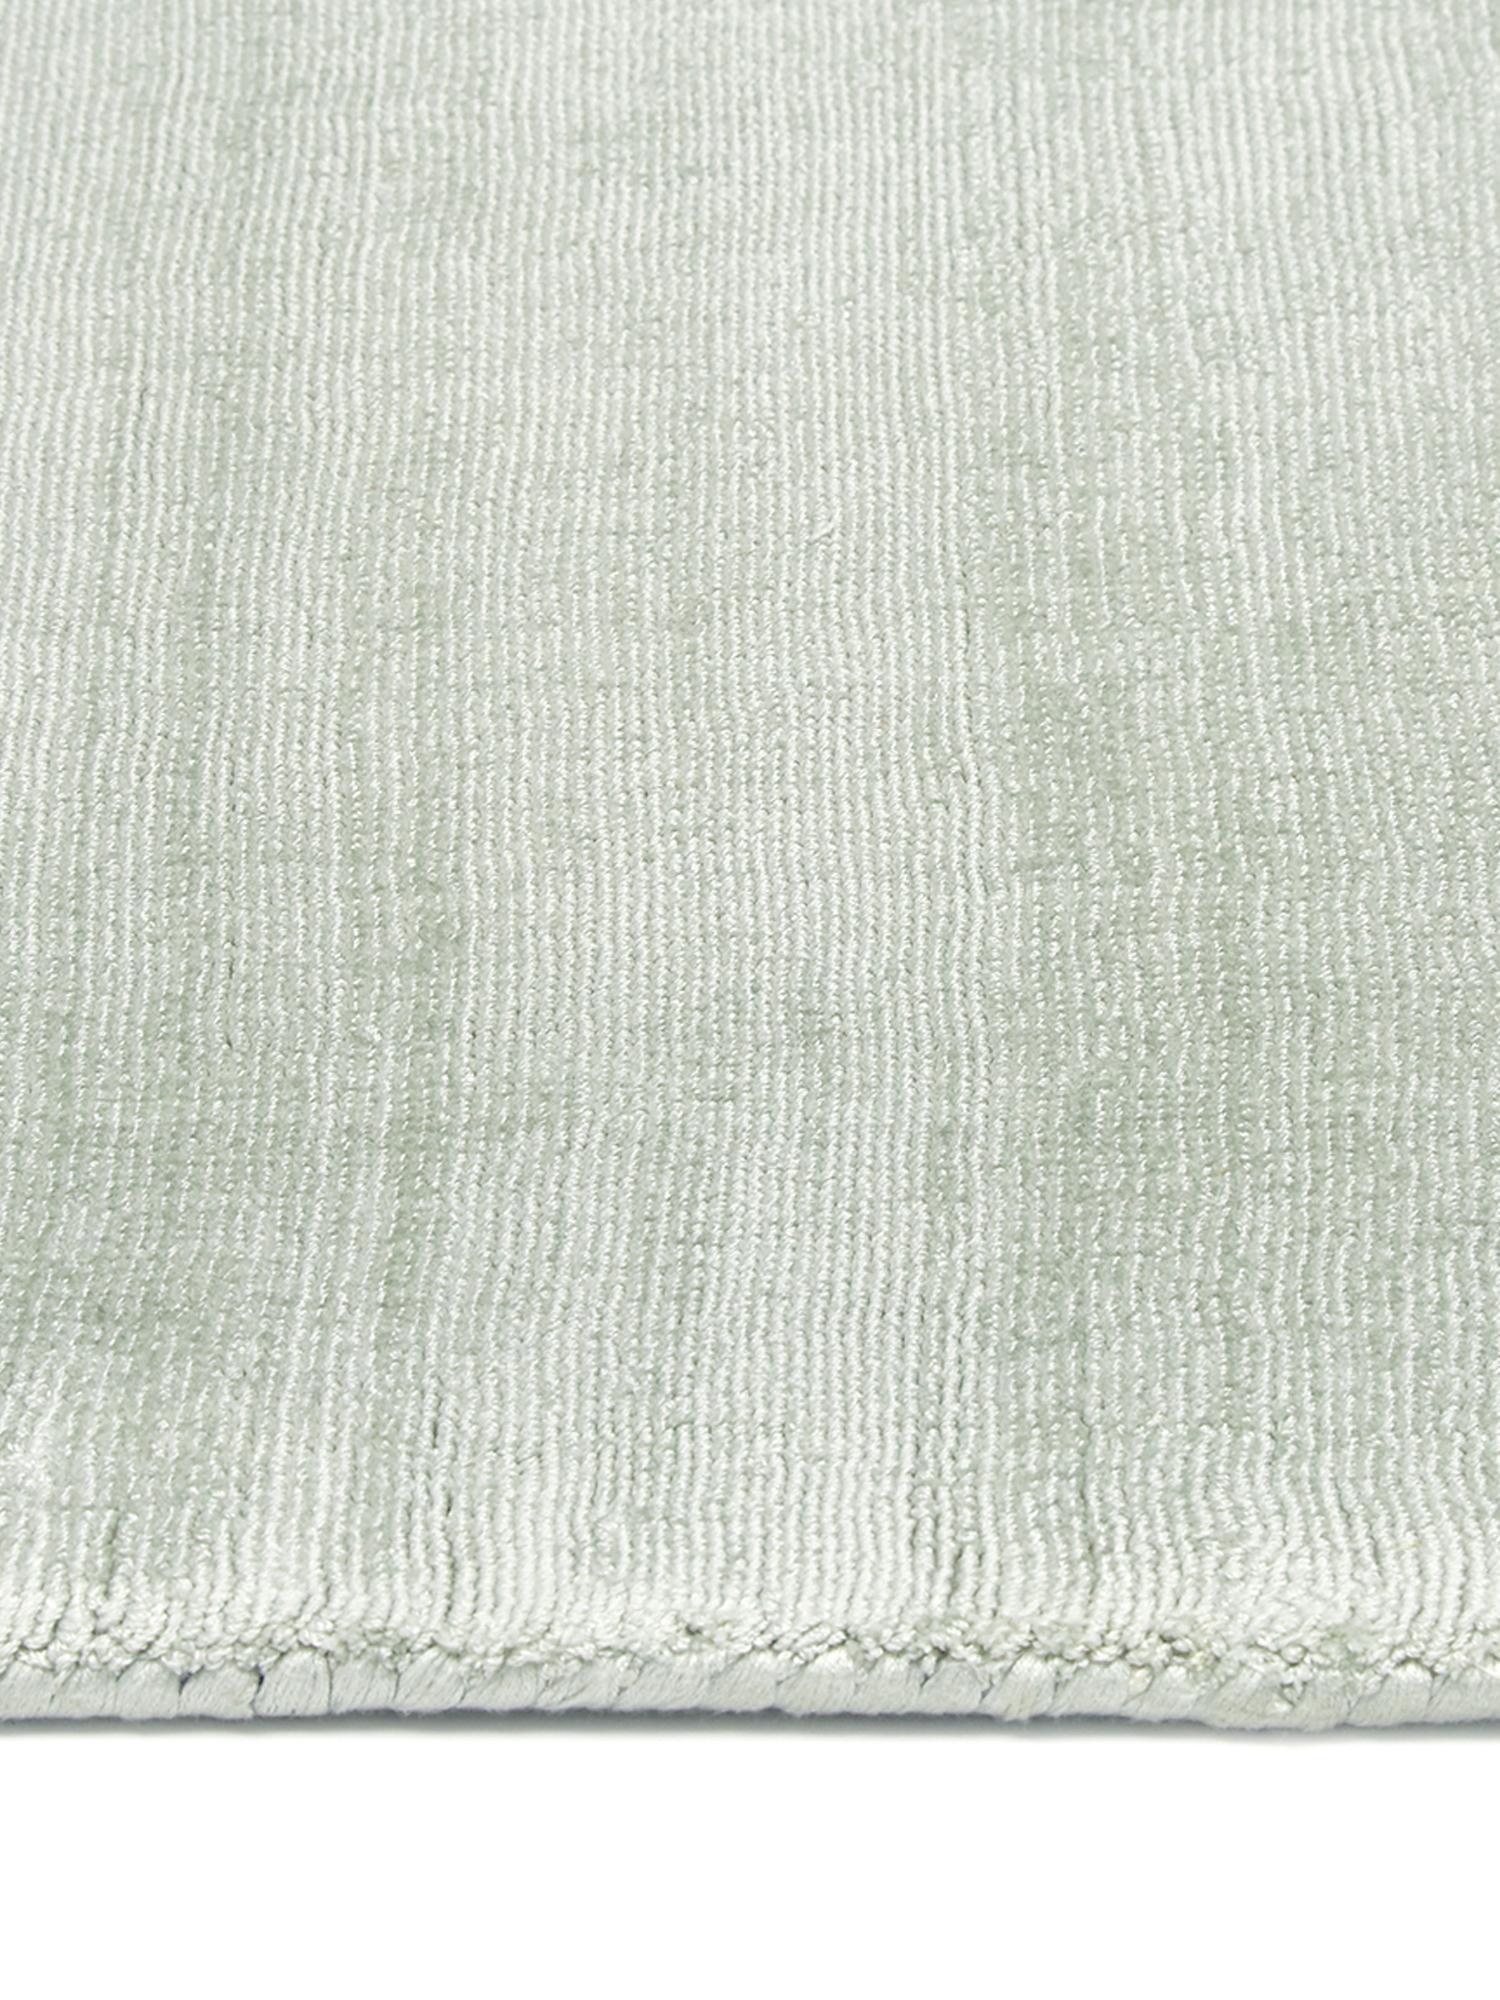 Handgewebter Viskoseteppich Jane in Lindgrün, Flor: 100% Viskose, Lindgrün, B 160 x L 230 cm (Grösse M)